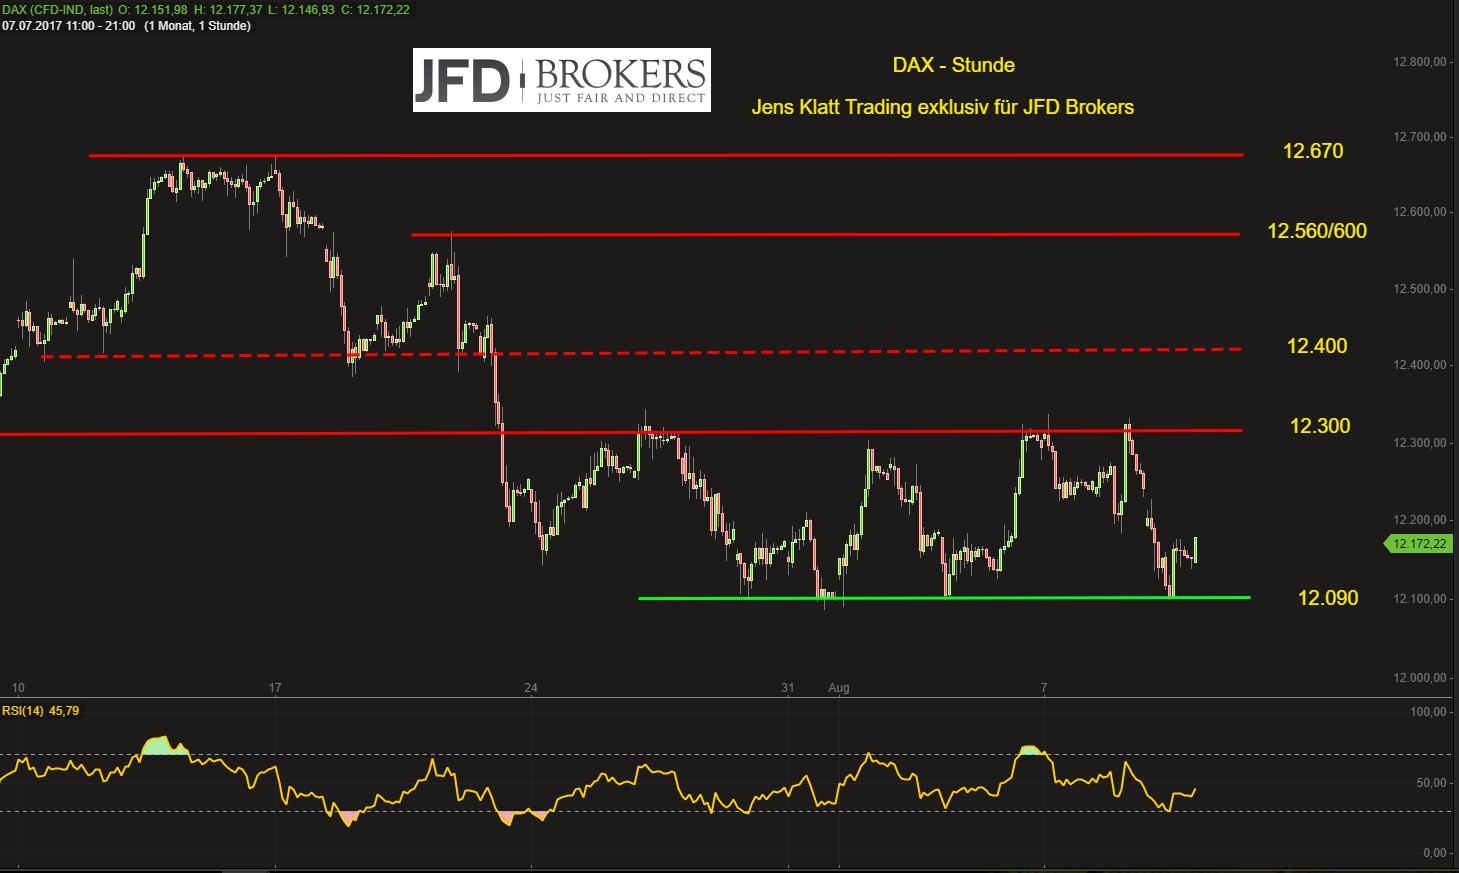 DAX-Bullen-zittern-12-100er-Marke-unter-Druck-JFD-Brokers-GodmodeTrader.de-2